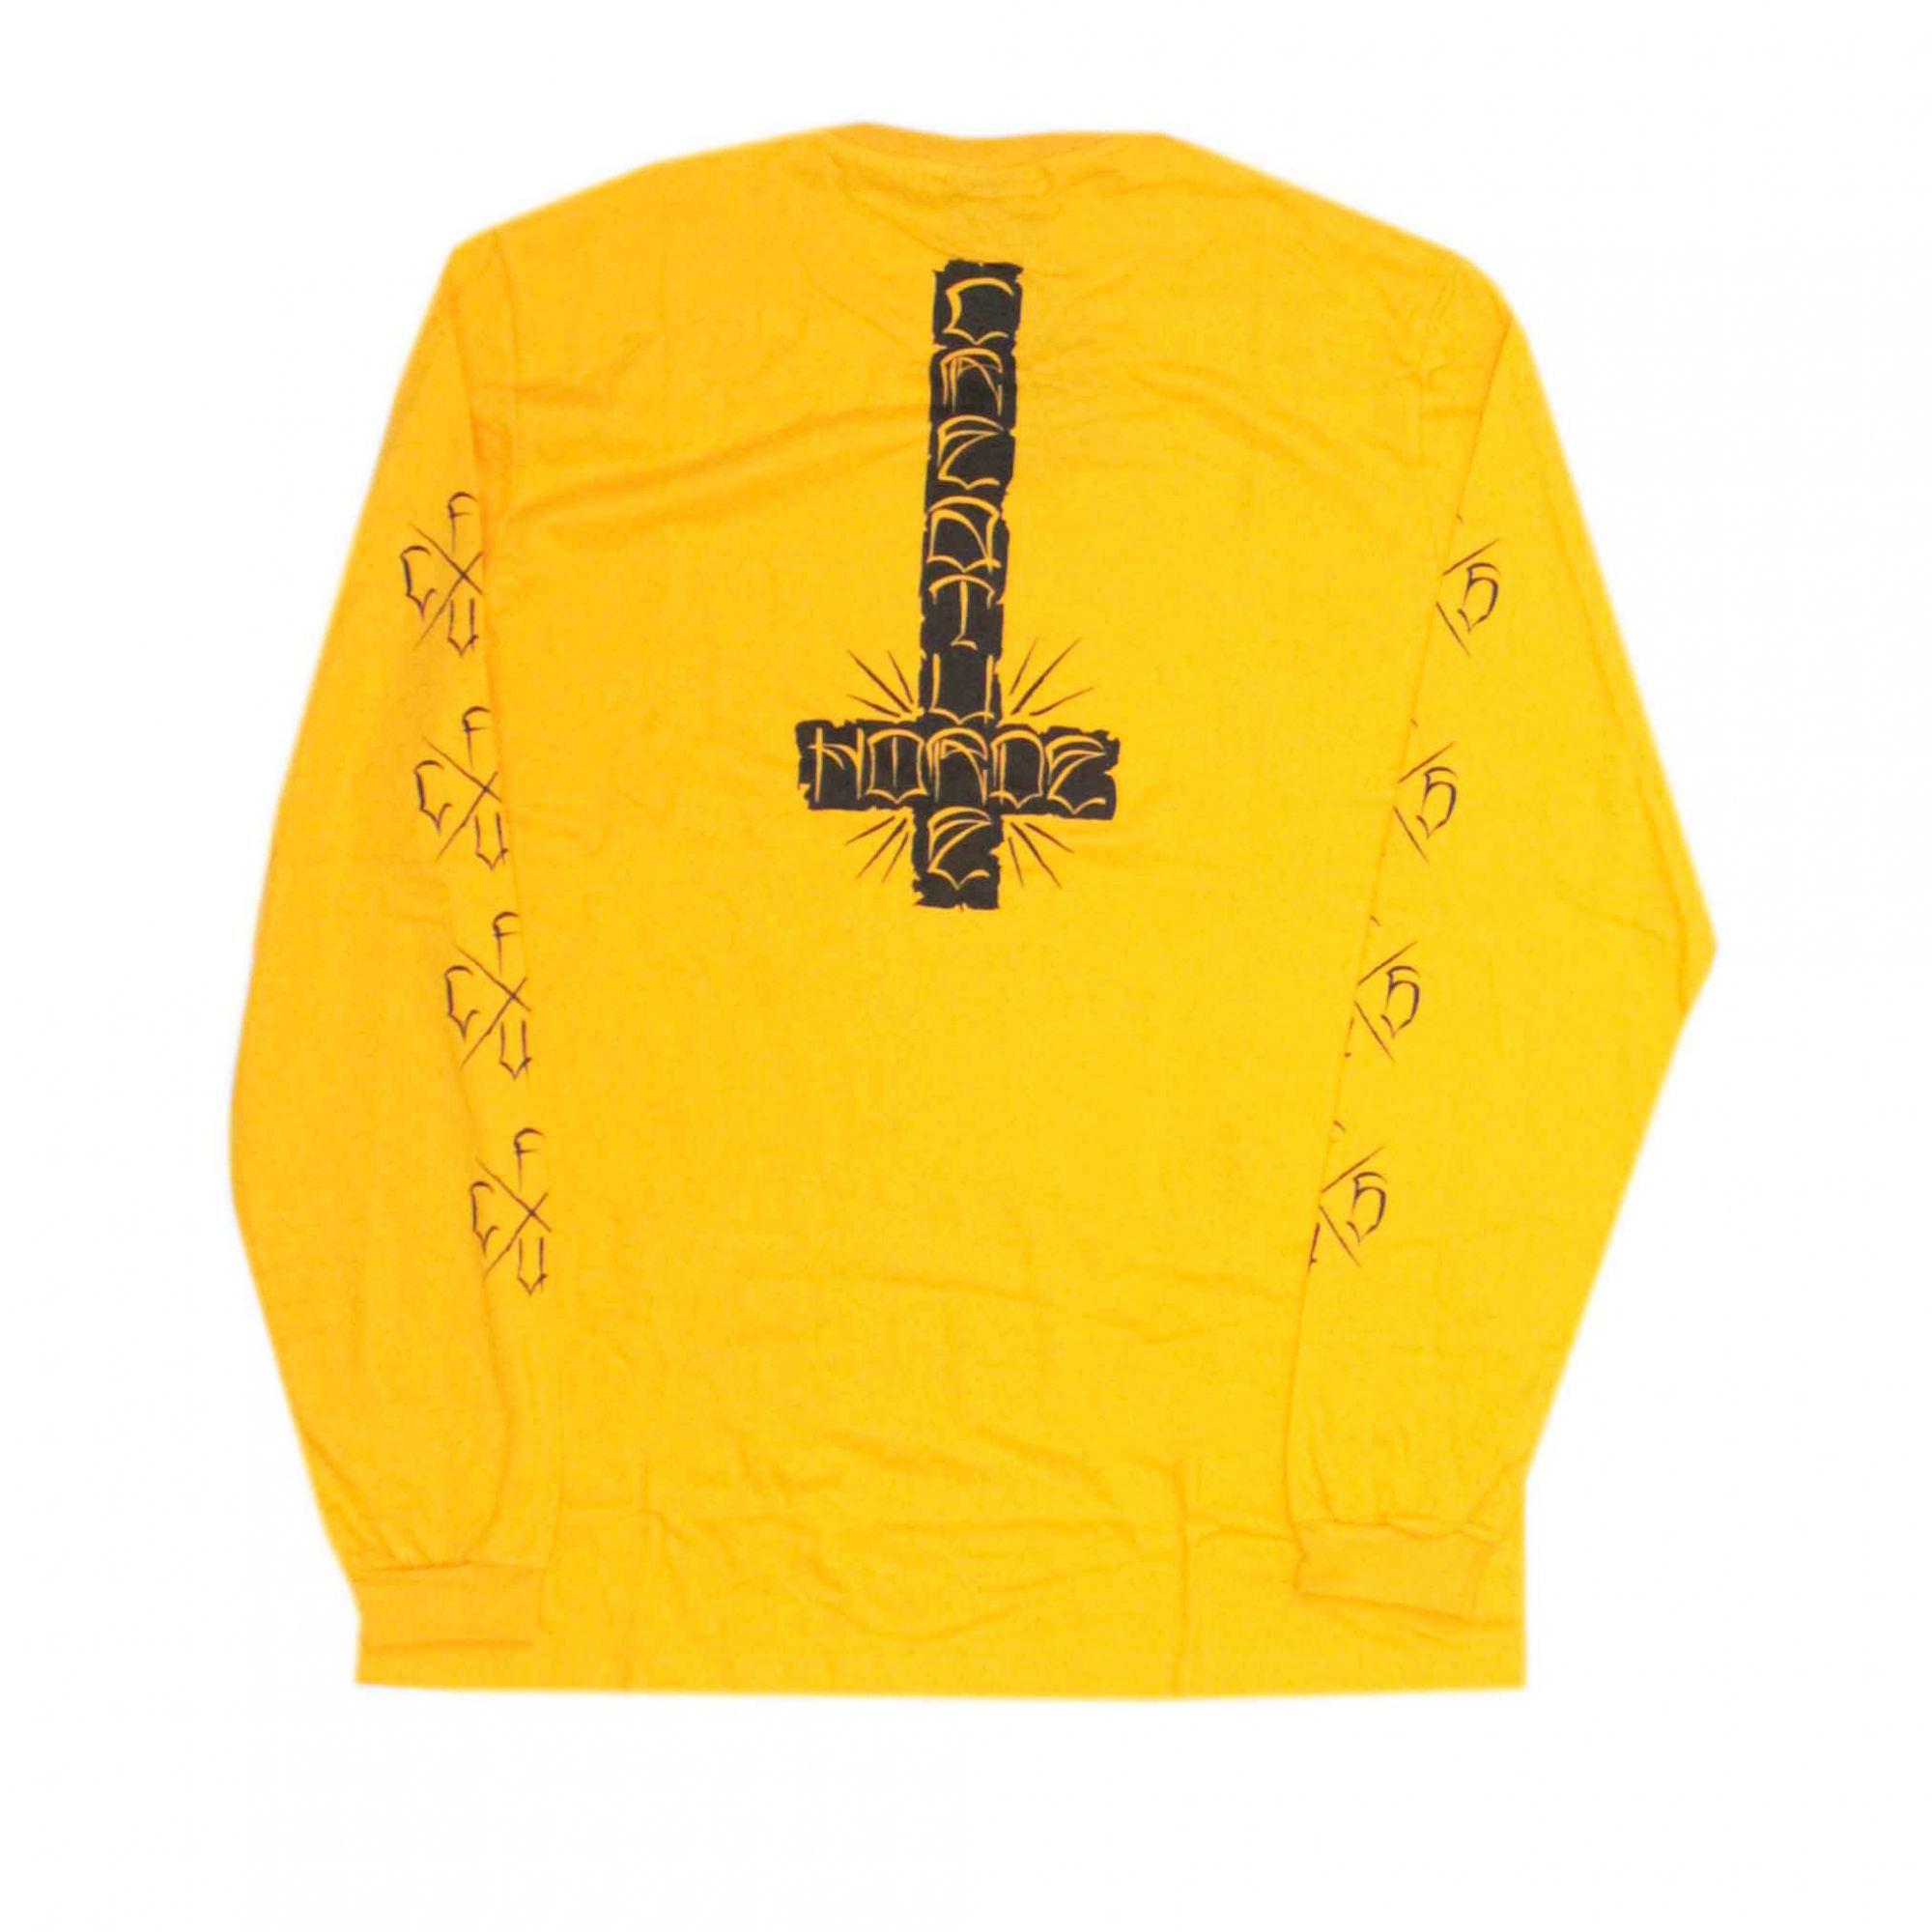 Camiseta Manga Longa Creature Horde Cross - Amarela